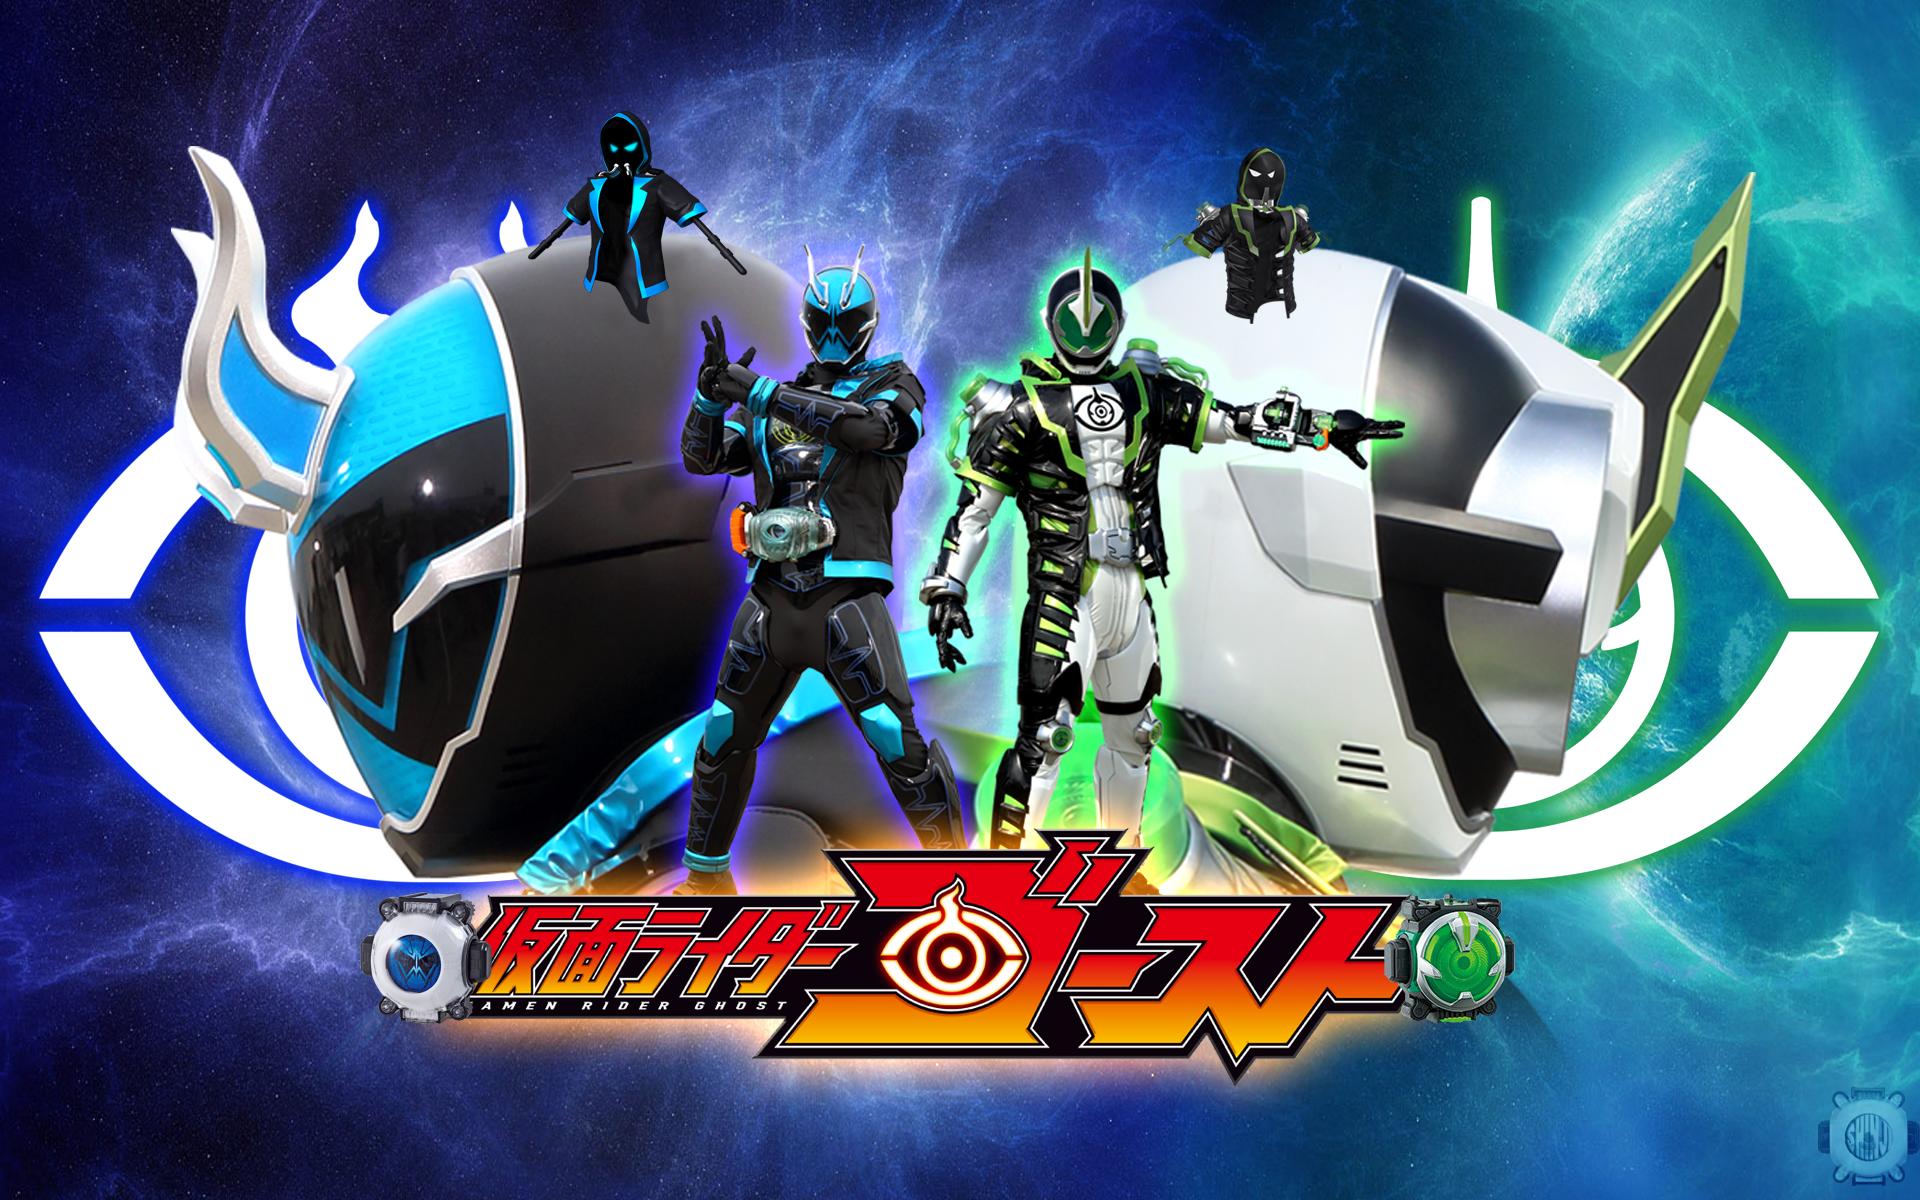 Kamen Rider Necrom: Kamen Rider Specter ( Spectre ) X Necrom Wallpaper By